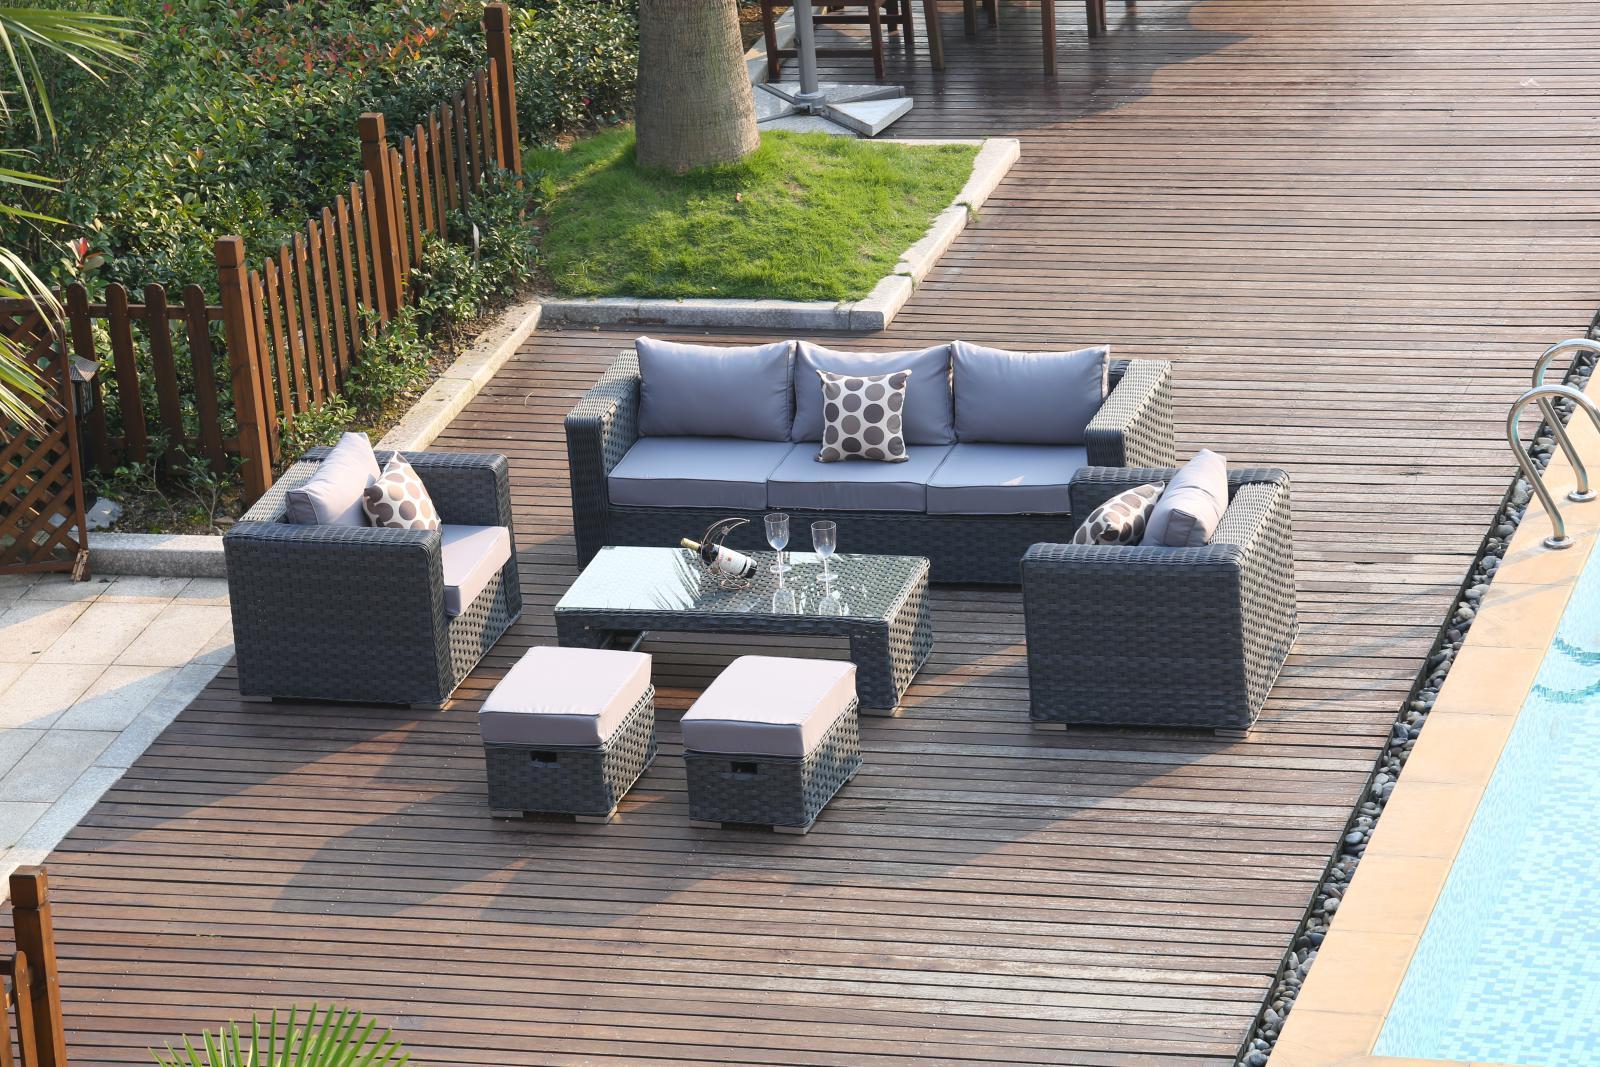 Papaver 7seater Rattan Sofa Set Patio Conservatory Garden